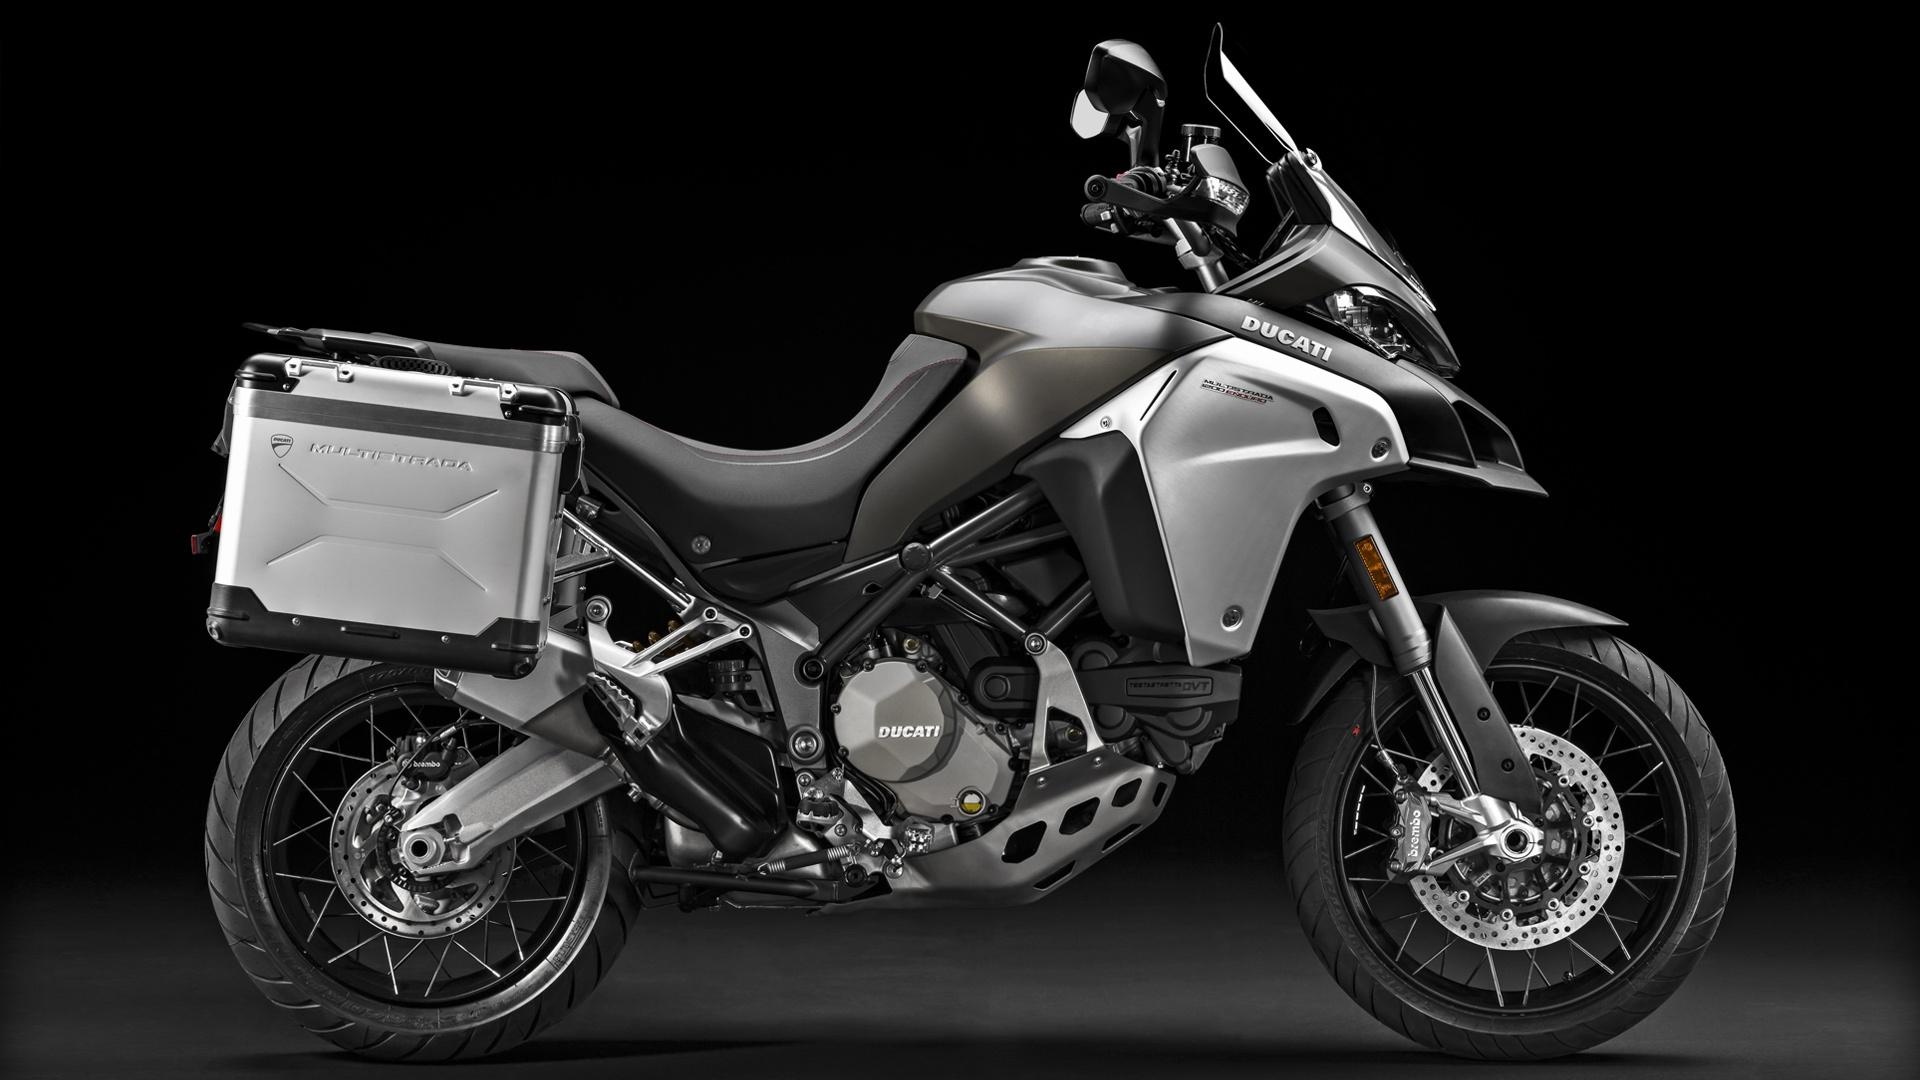 DUCATI MULTISTRADA 1200 ENDURO ― Артмото - купить квадроцикл в украине и харькове, мотоцикл, снегоход, скутер, мопед, электромобиль